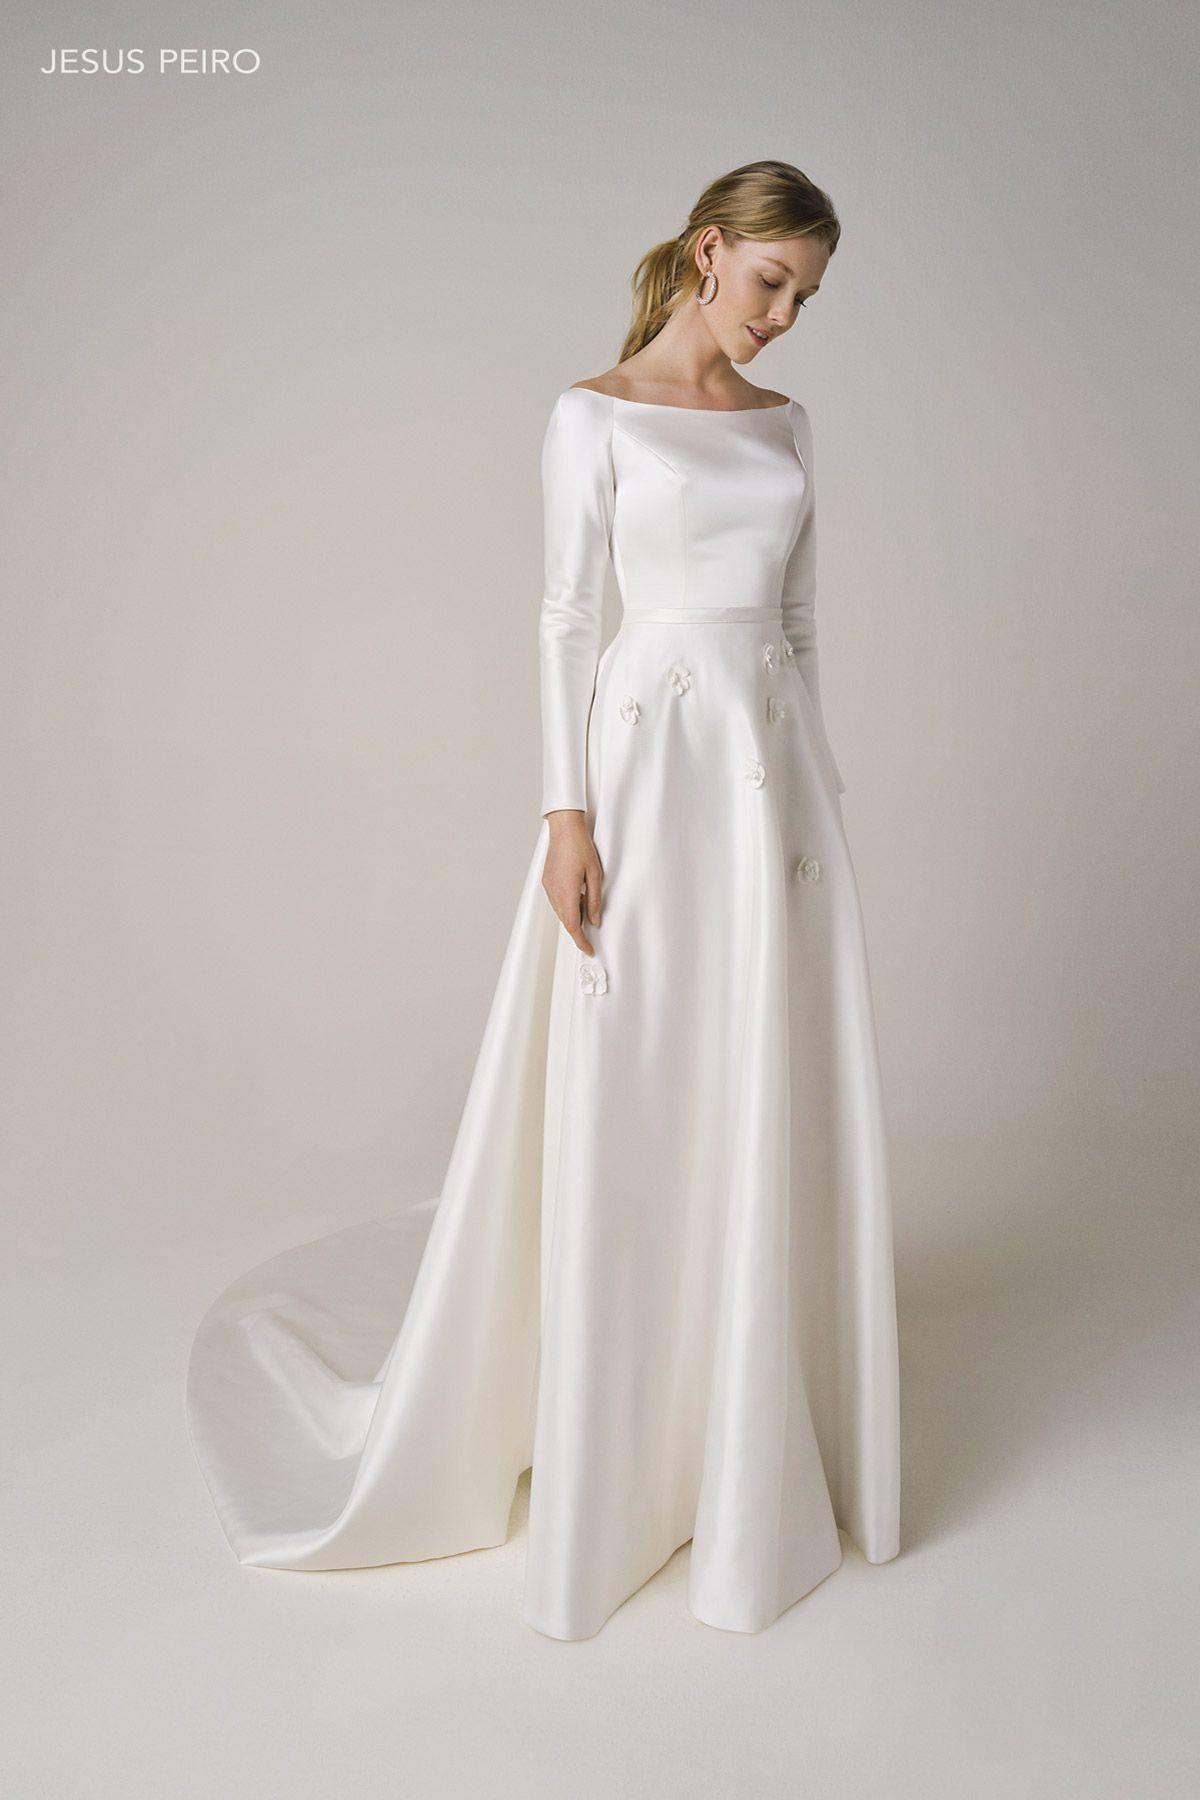 Jesus Peiro Amalia Collection 2021 In 2020 Dresses Wedding Dresses Wedding Dress Styles